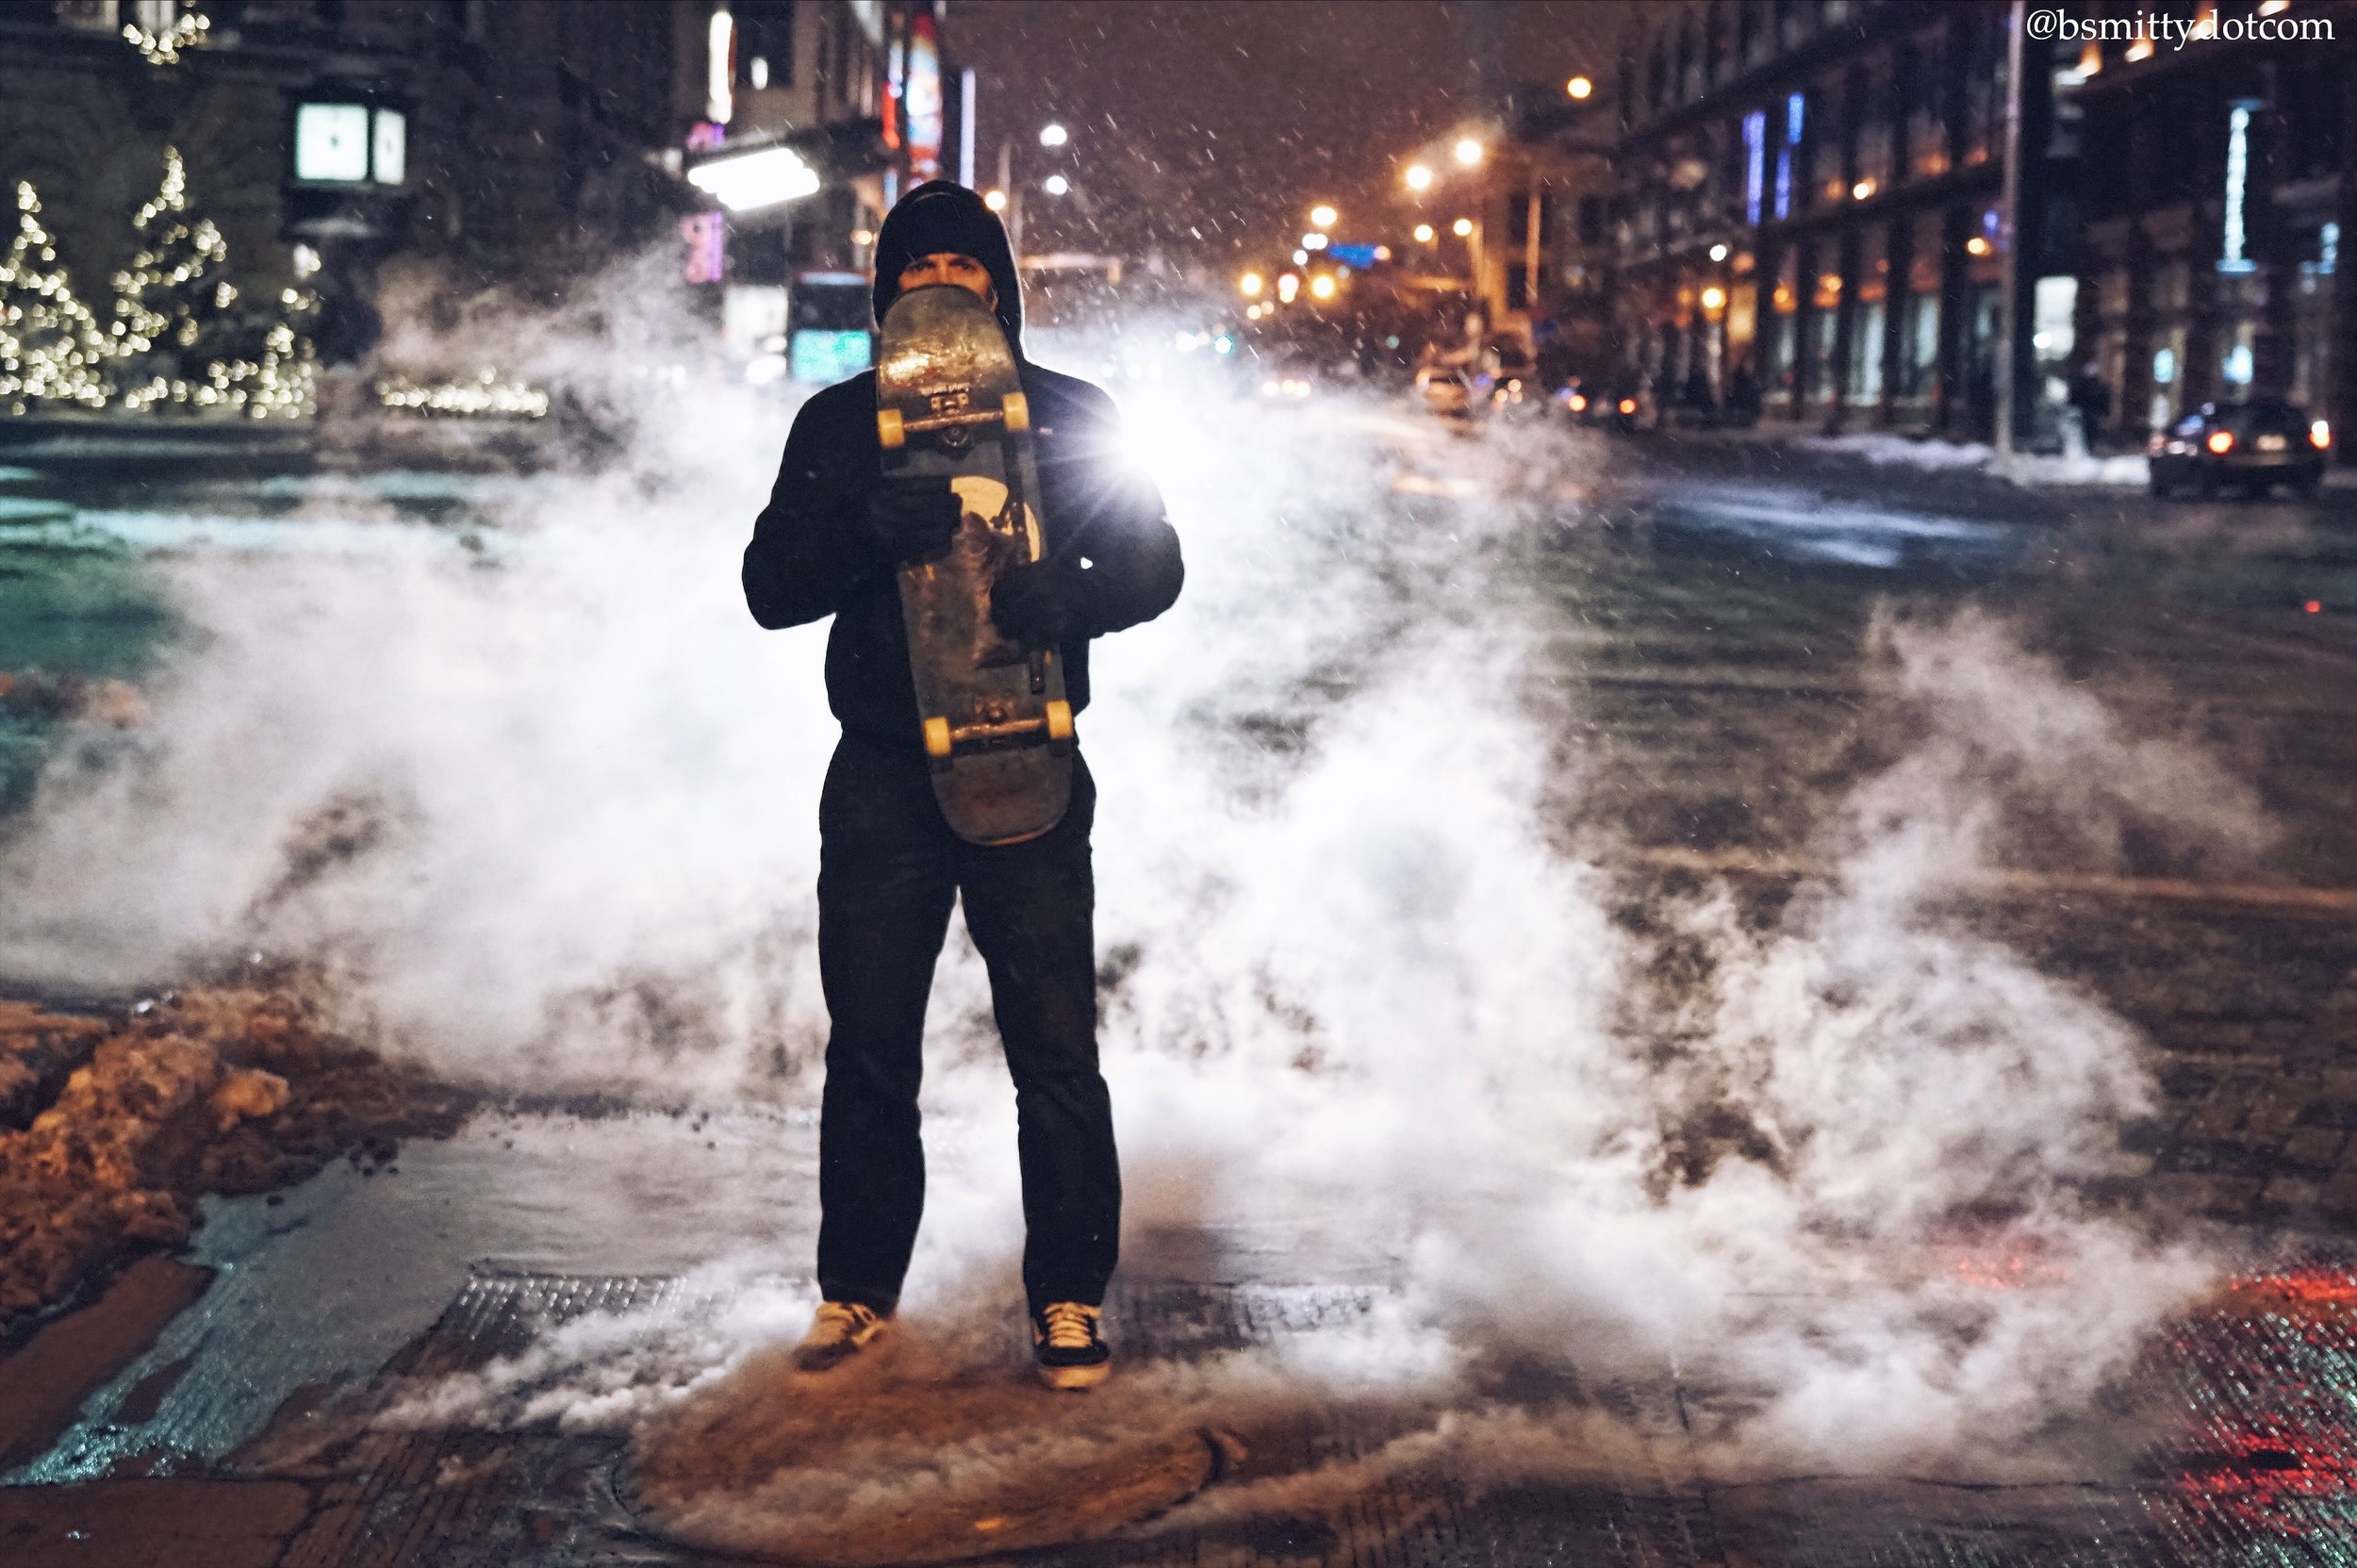 Kristian Svitak frozen Cleveland